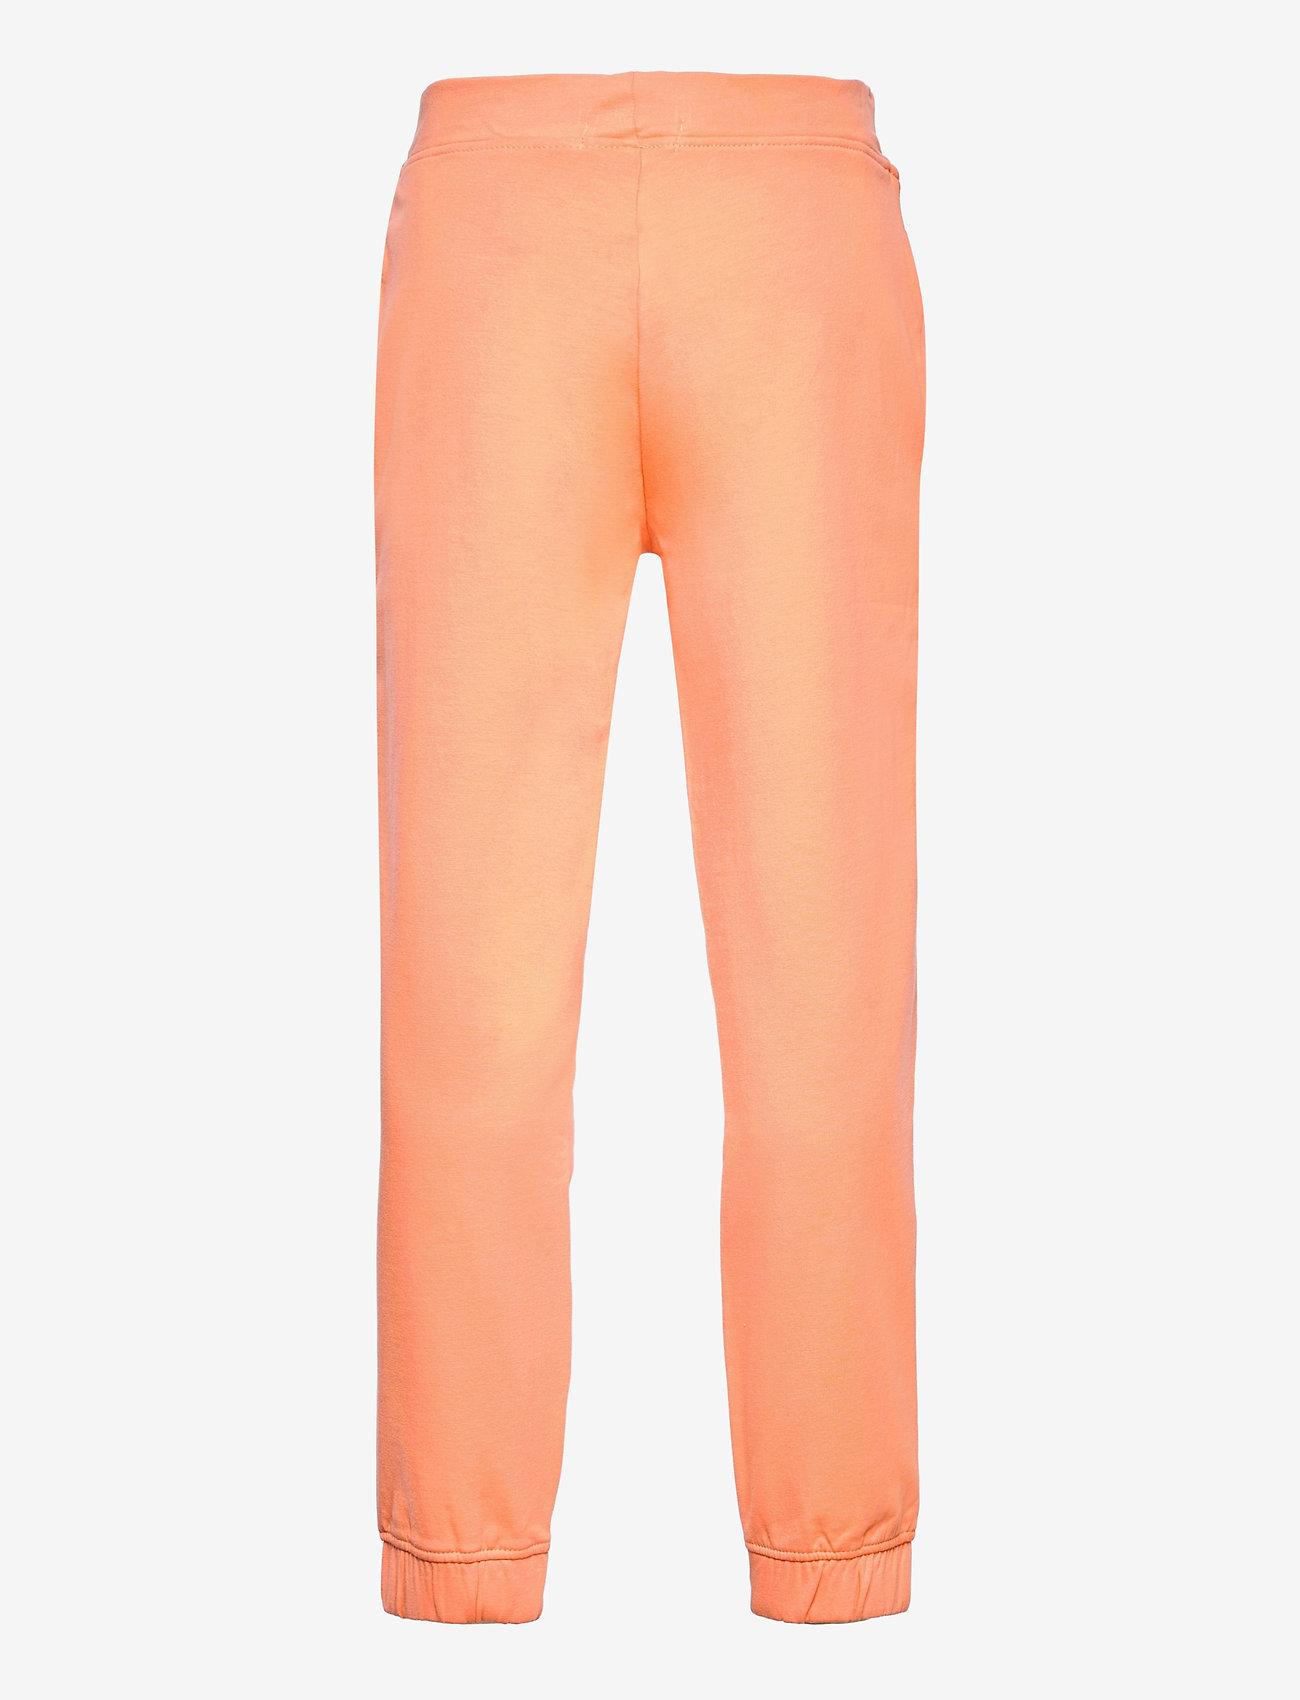 name it - NKFHOWAY SWEAT PANT  BRU - jogginghosen - cantaloupe - 1